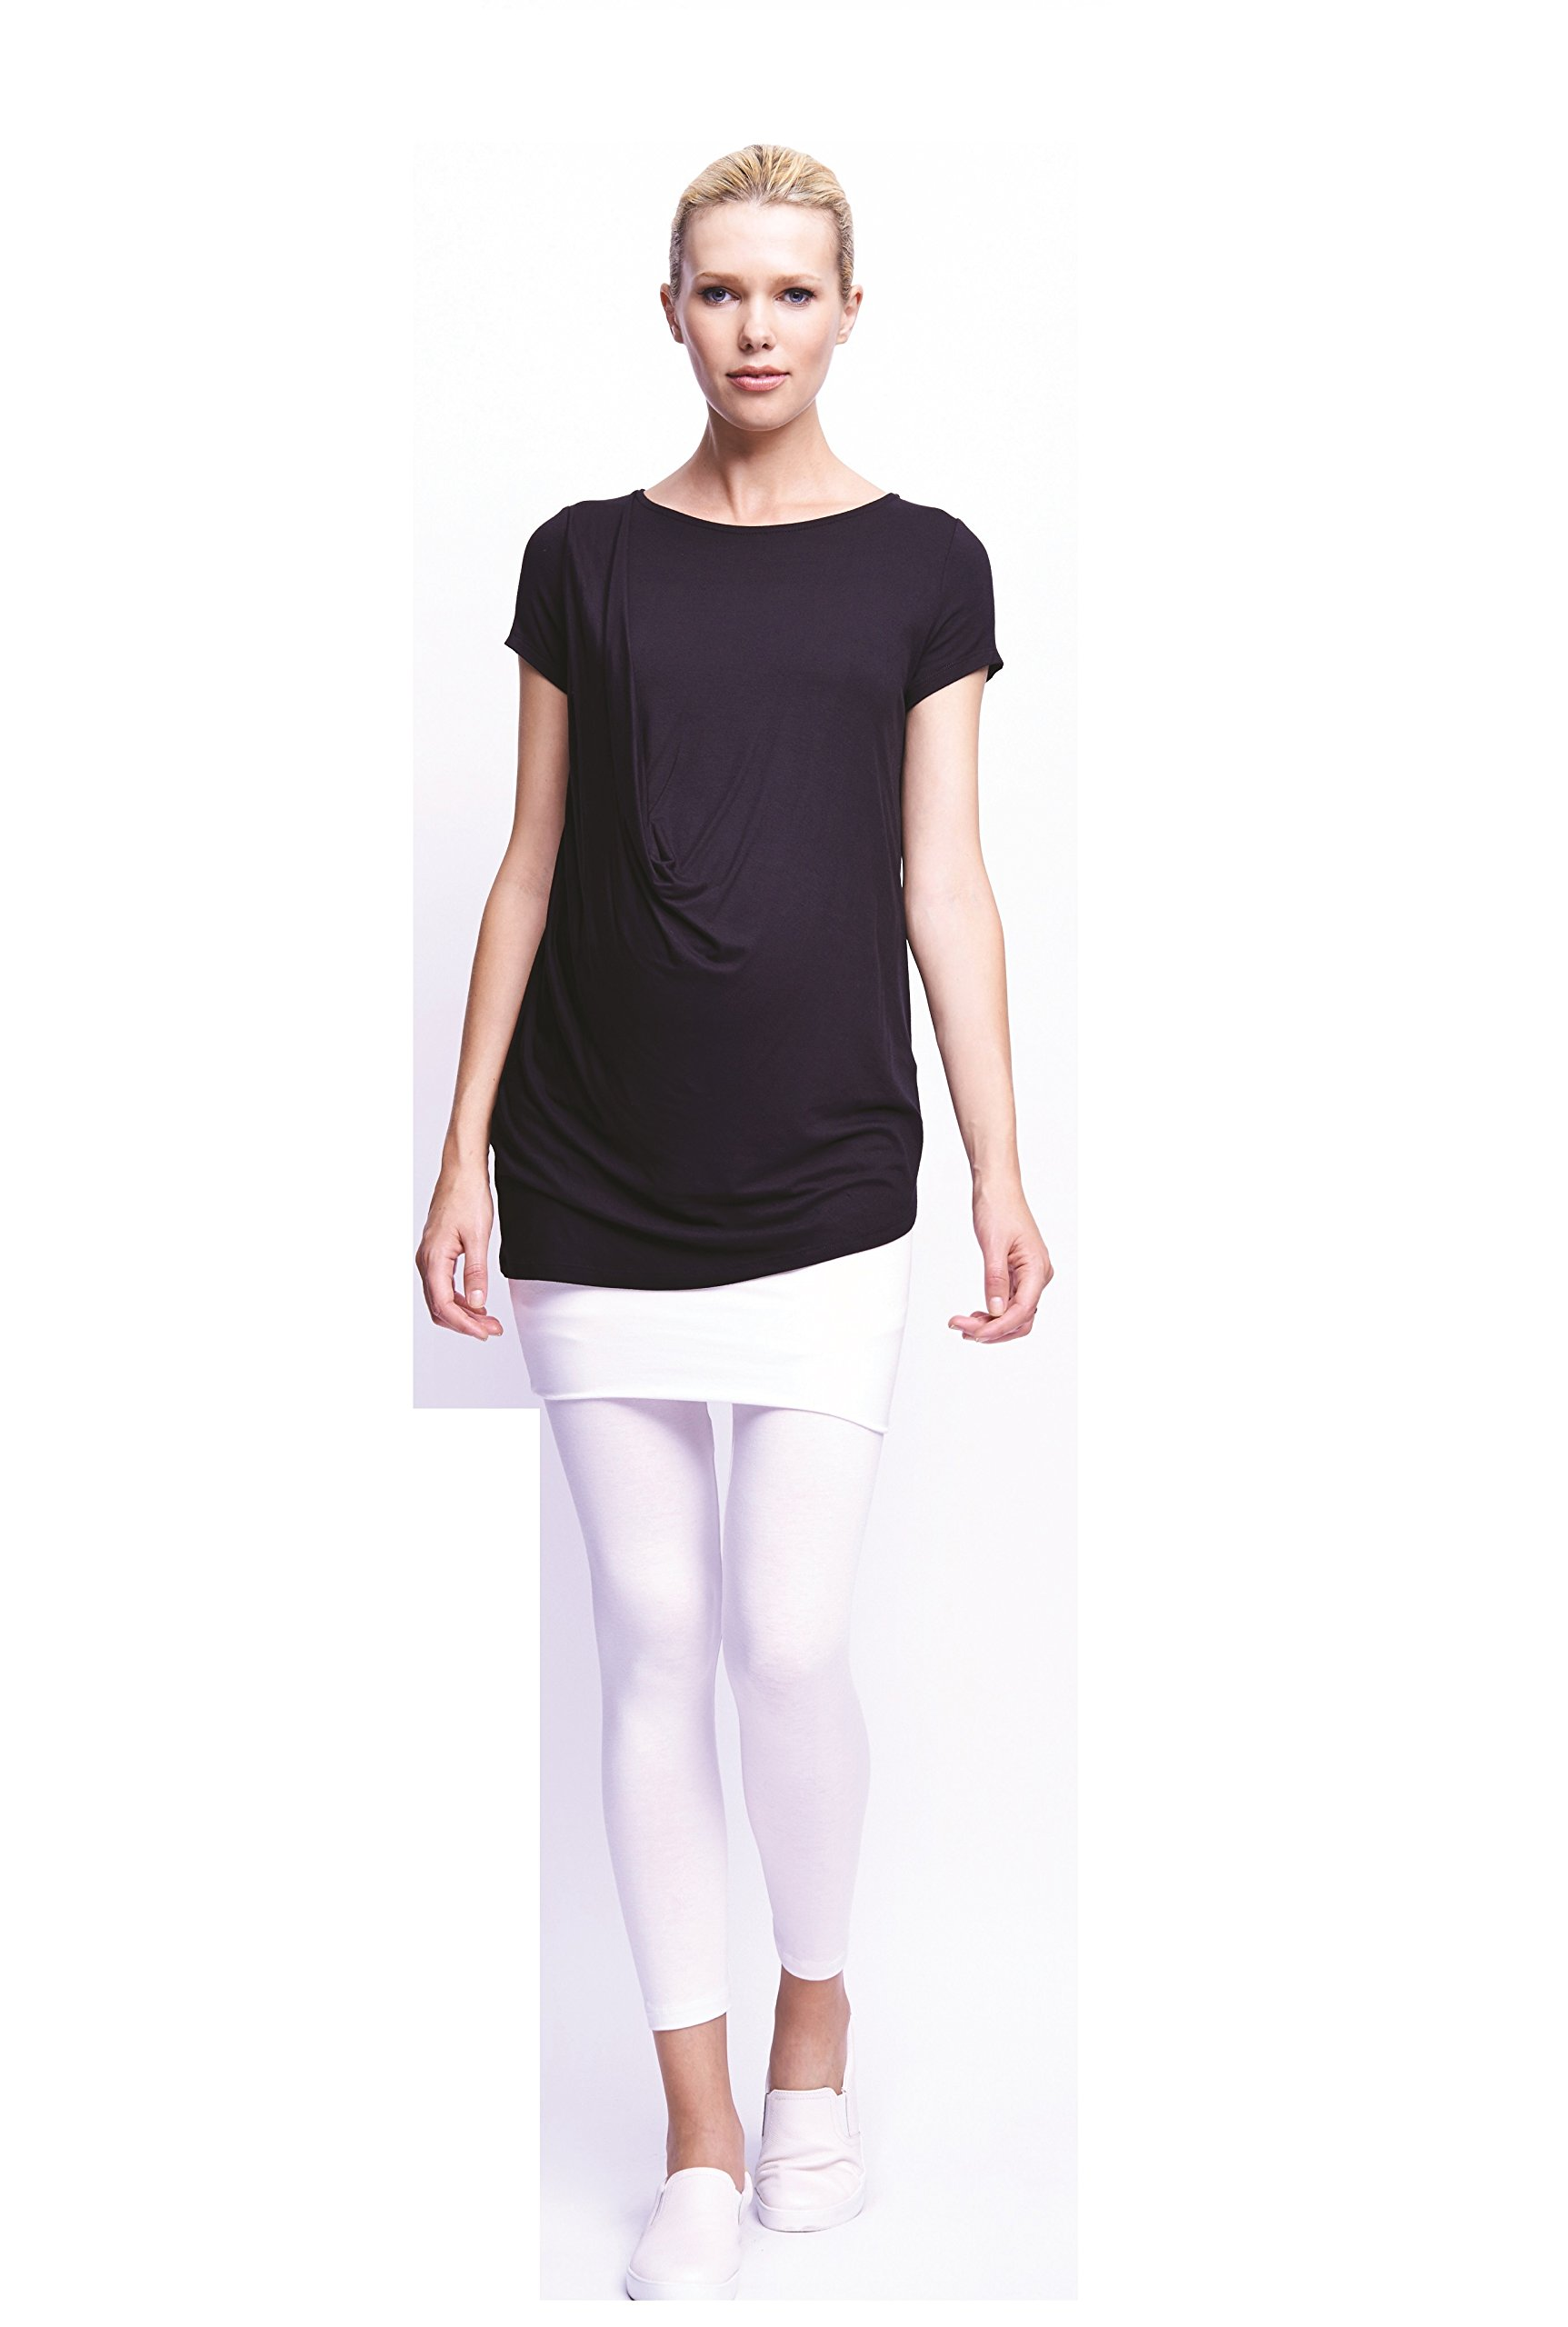 Maternal America Women's Maternity Shoulder Pleat Tee, Black, Medium